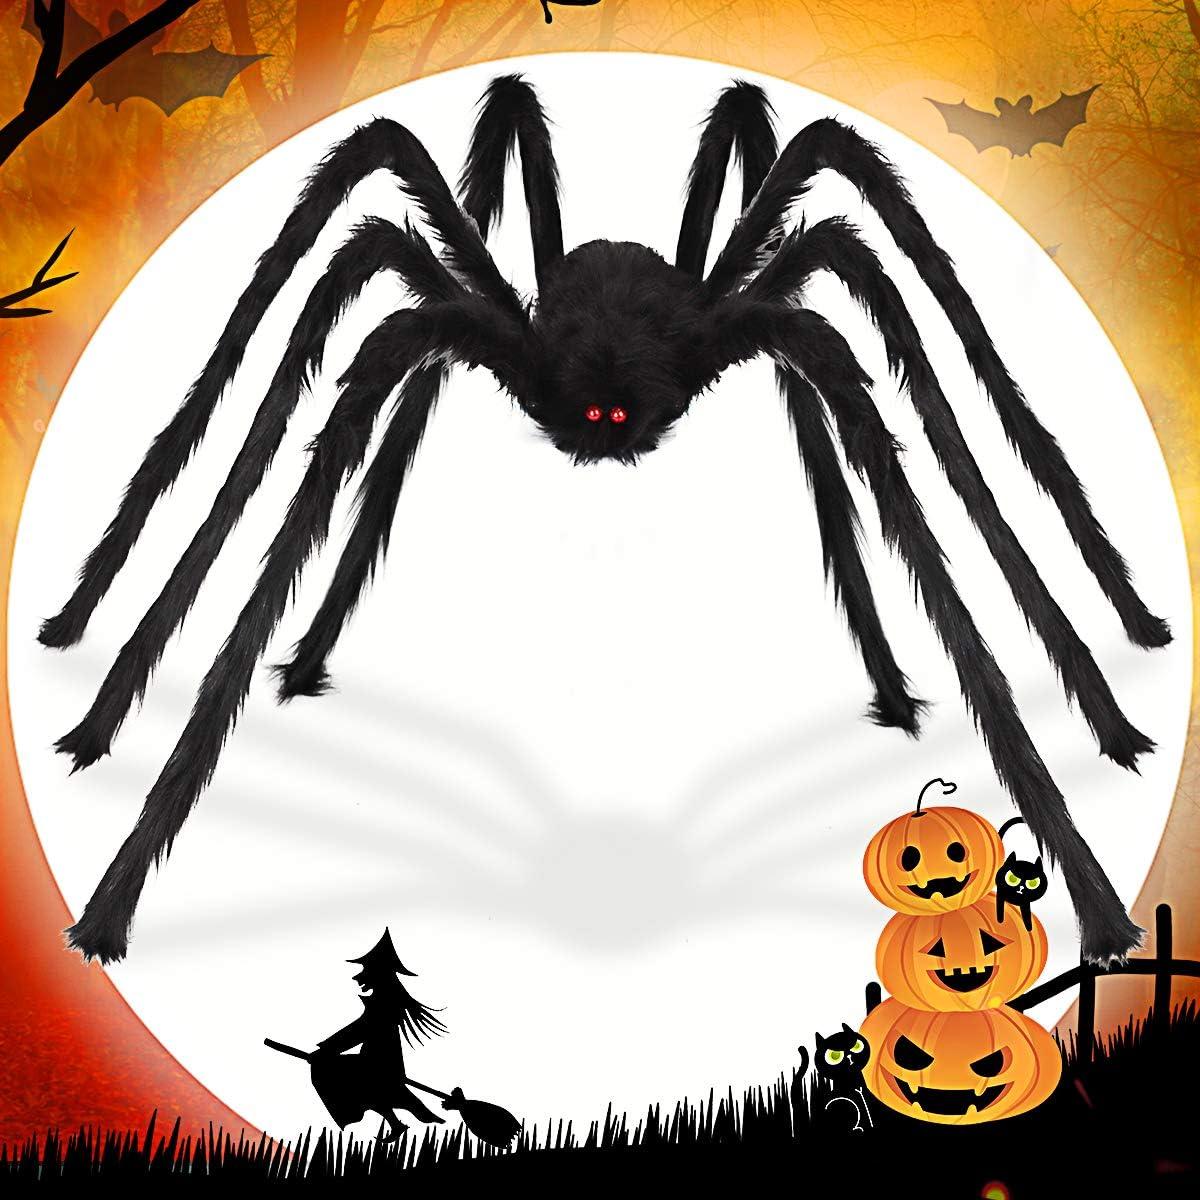 Aitey 8.5 FT Giant Spider Halloween Decorations, Outdoor Halloween Decoration Scary Fake Spider for Yard House Party Supplies Creepy Decor Black